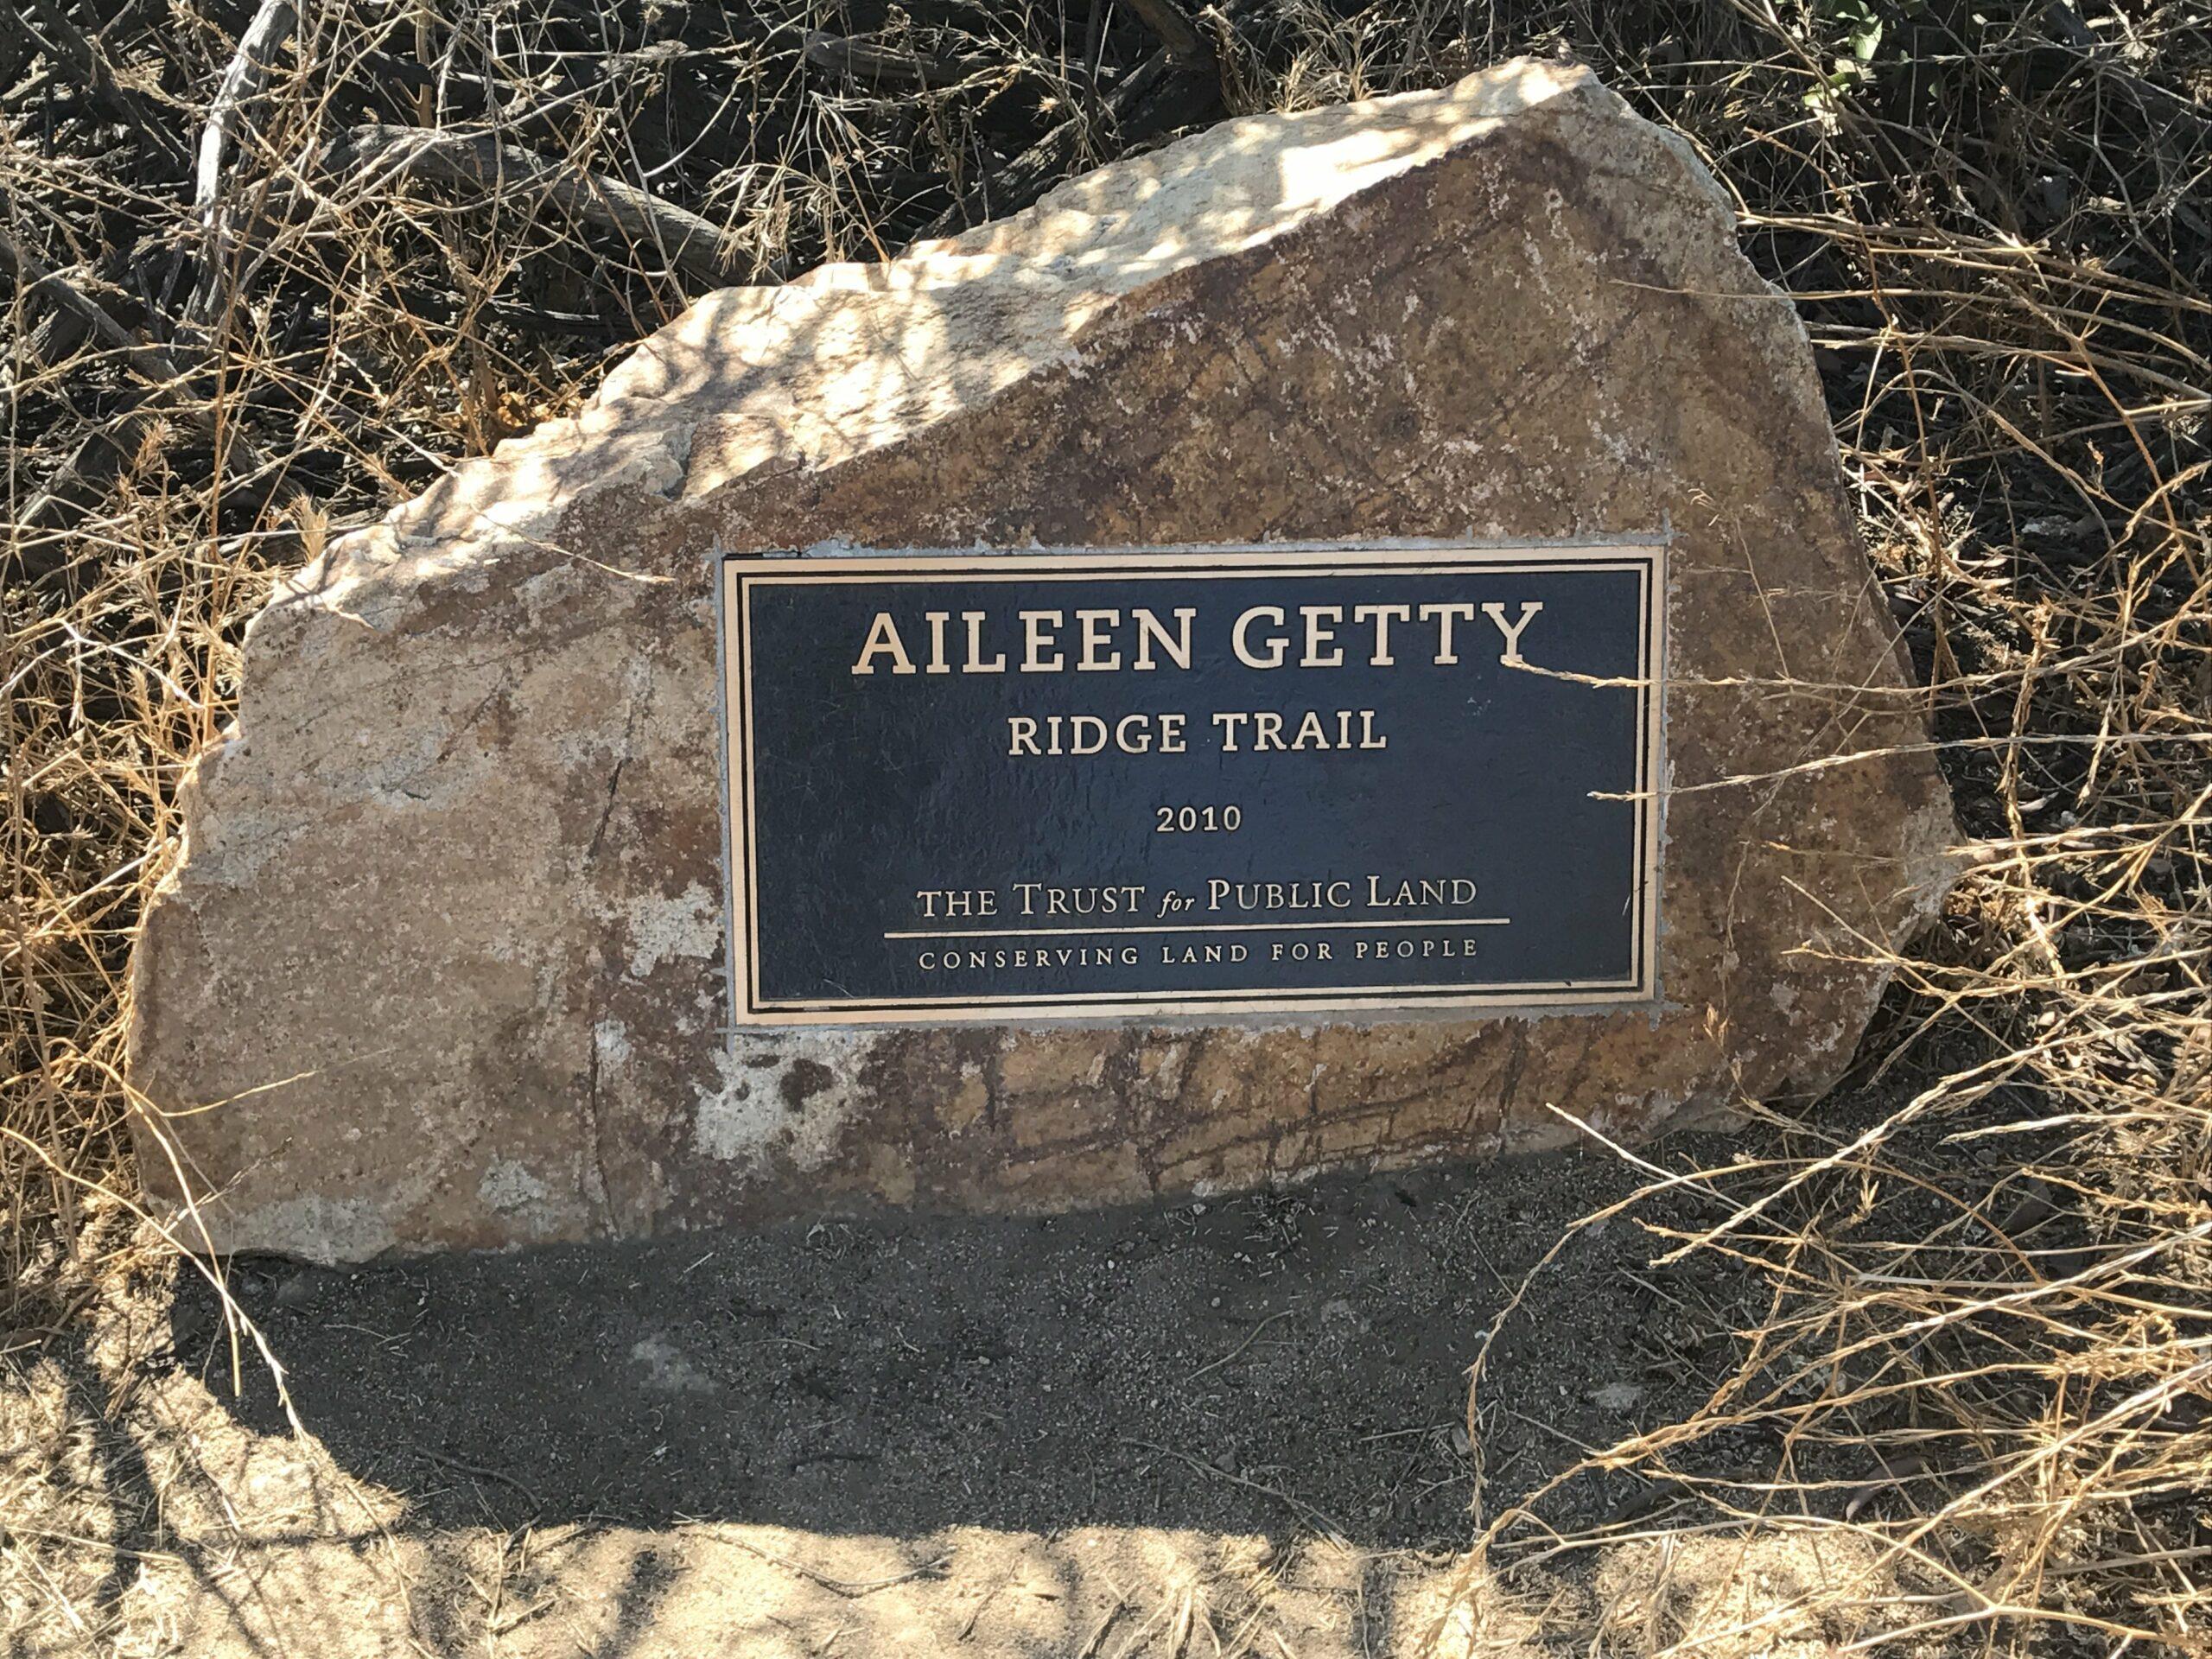 Aileen Getty Commemorative Stone